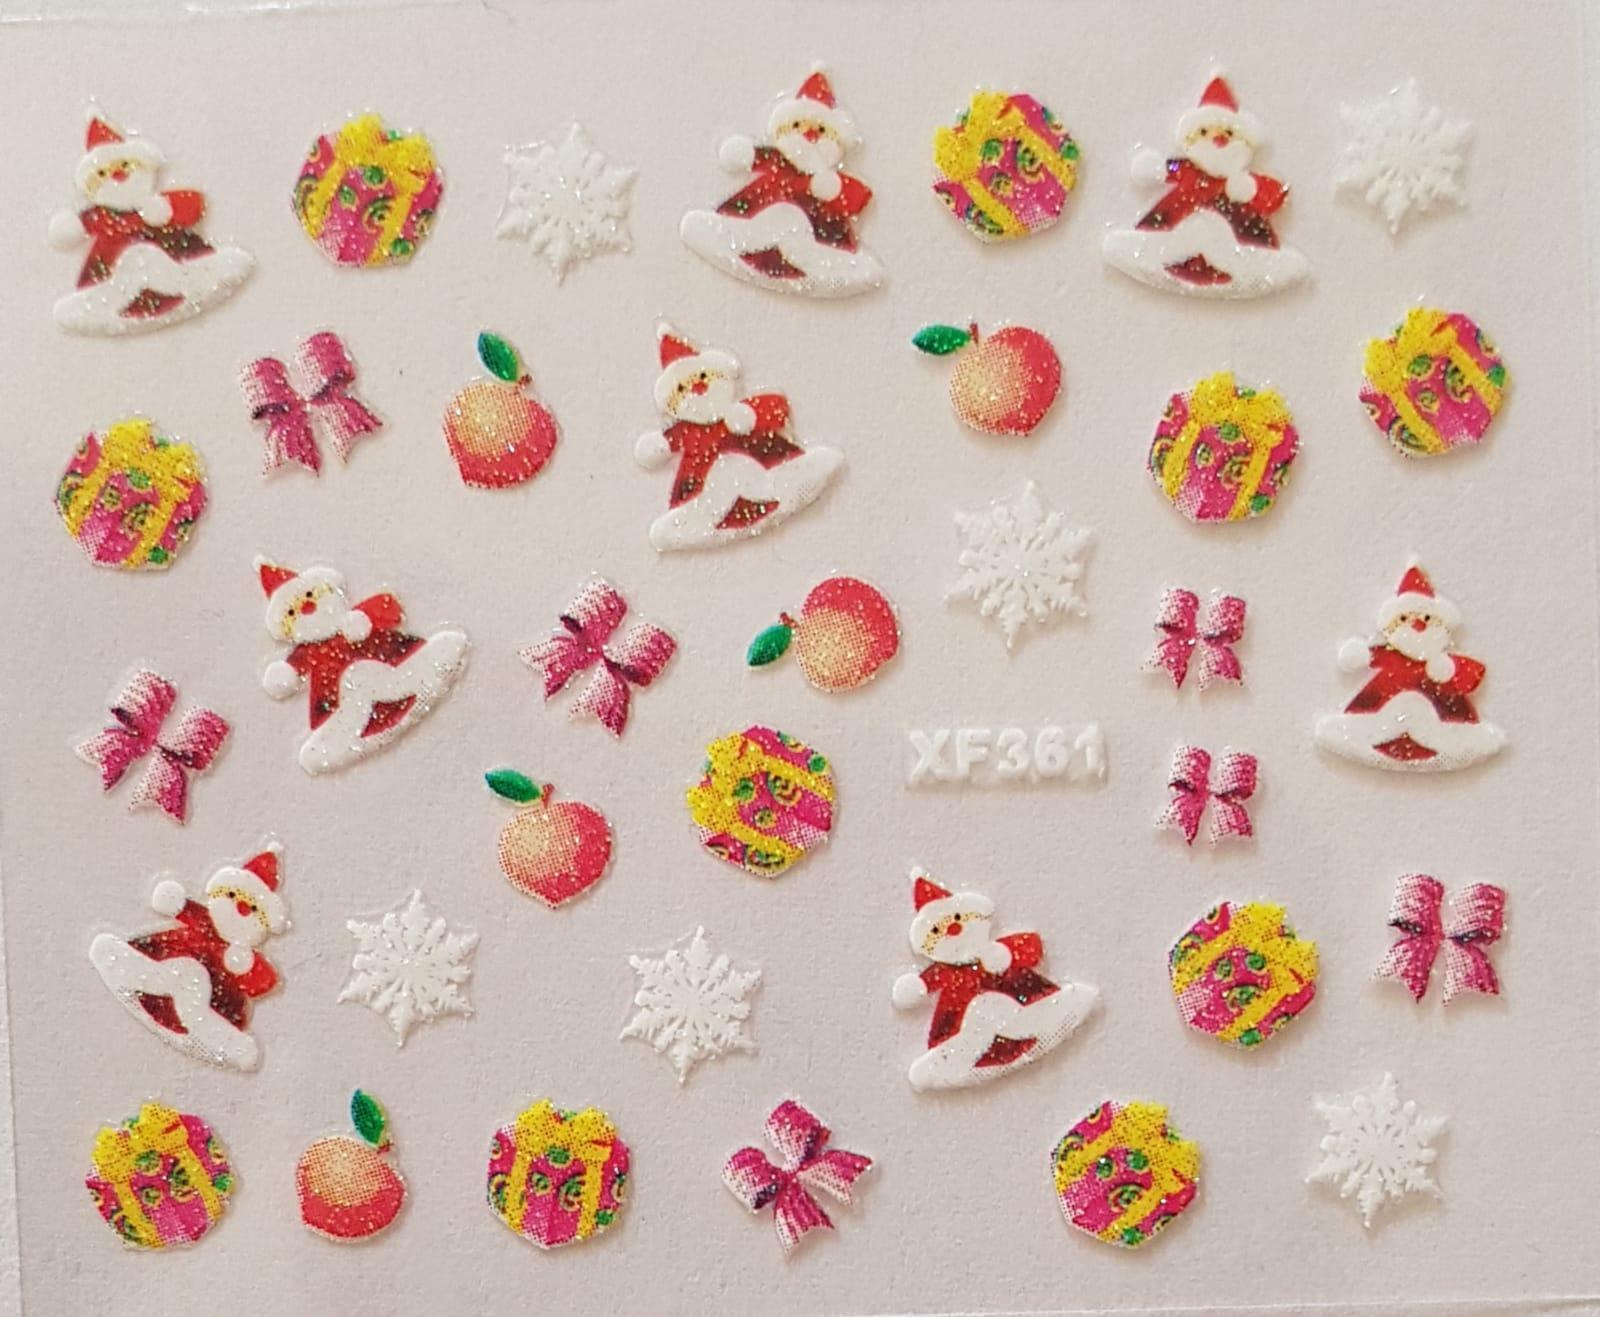 Stickers navideños xf-361